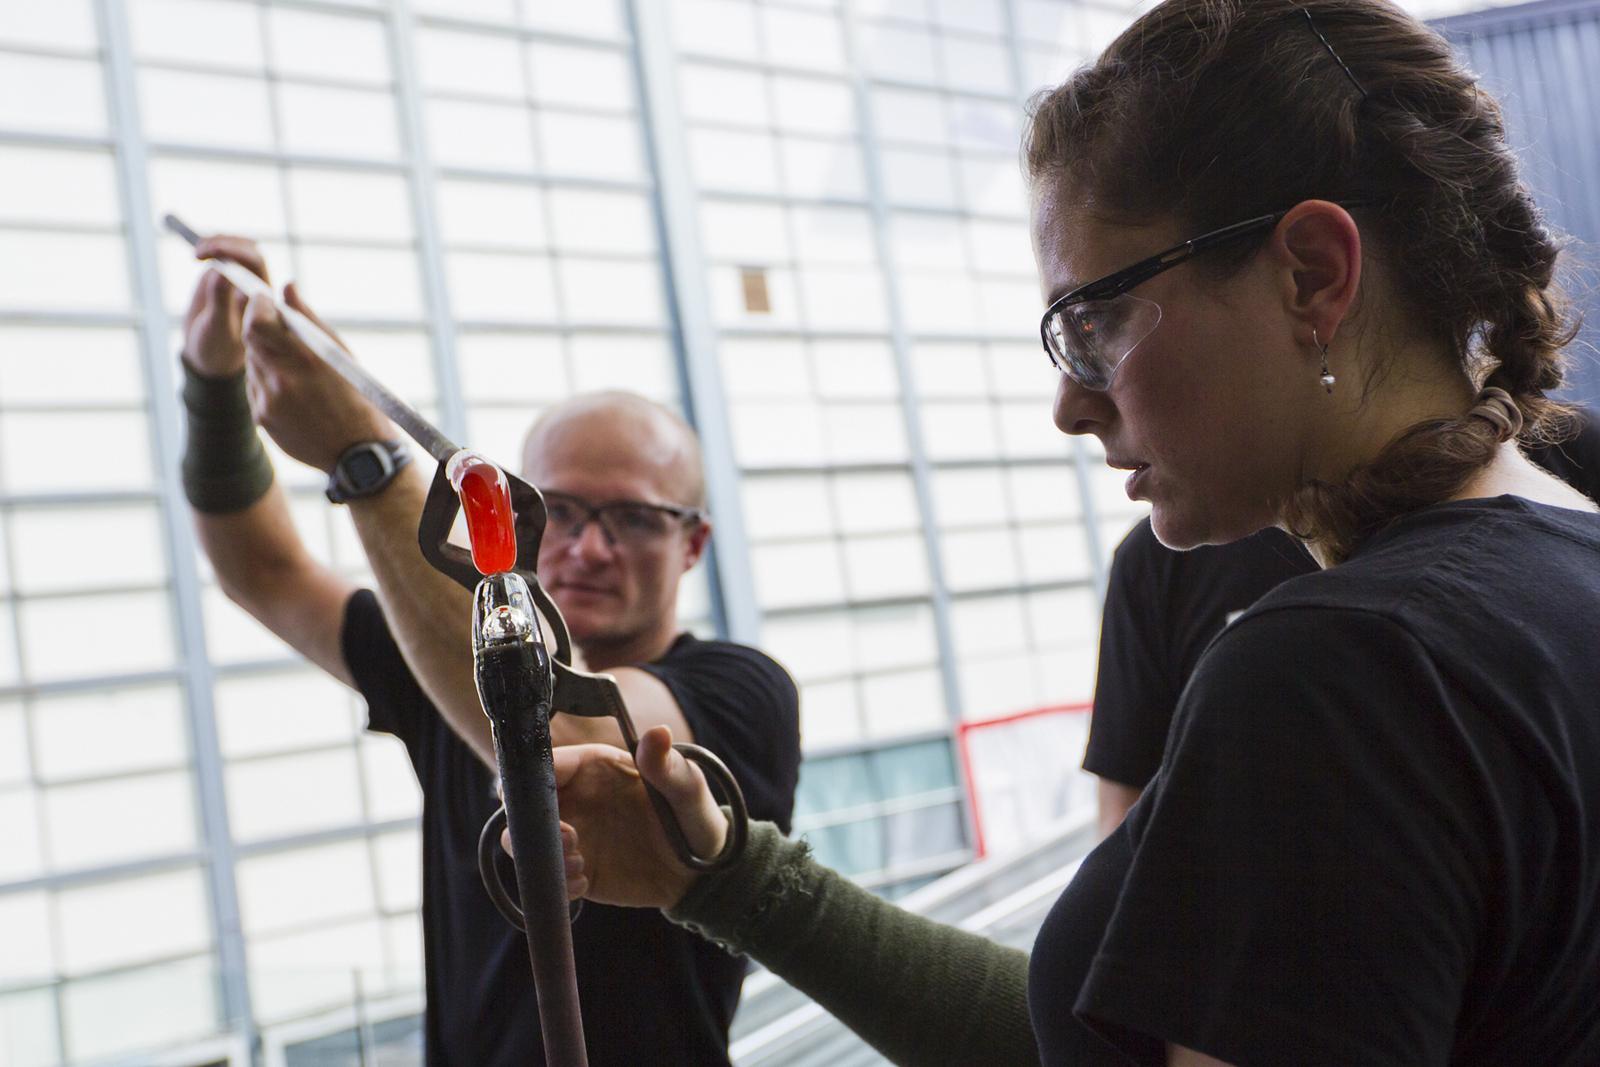 Glassmakers G Brian Juk and Annette Sheppard work with designer Jon Otis at GlassLab in Corning, July 2012